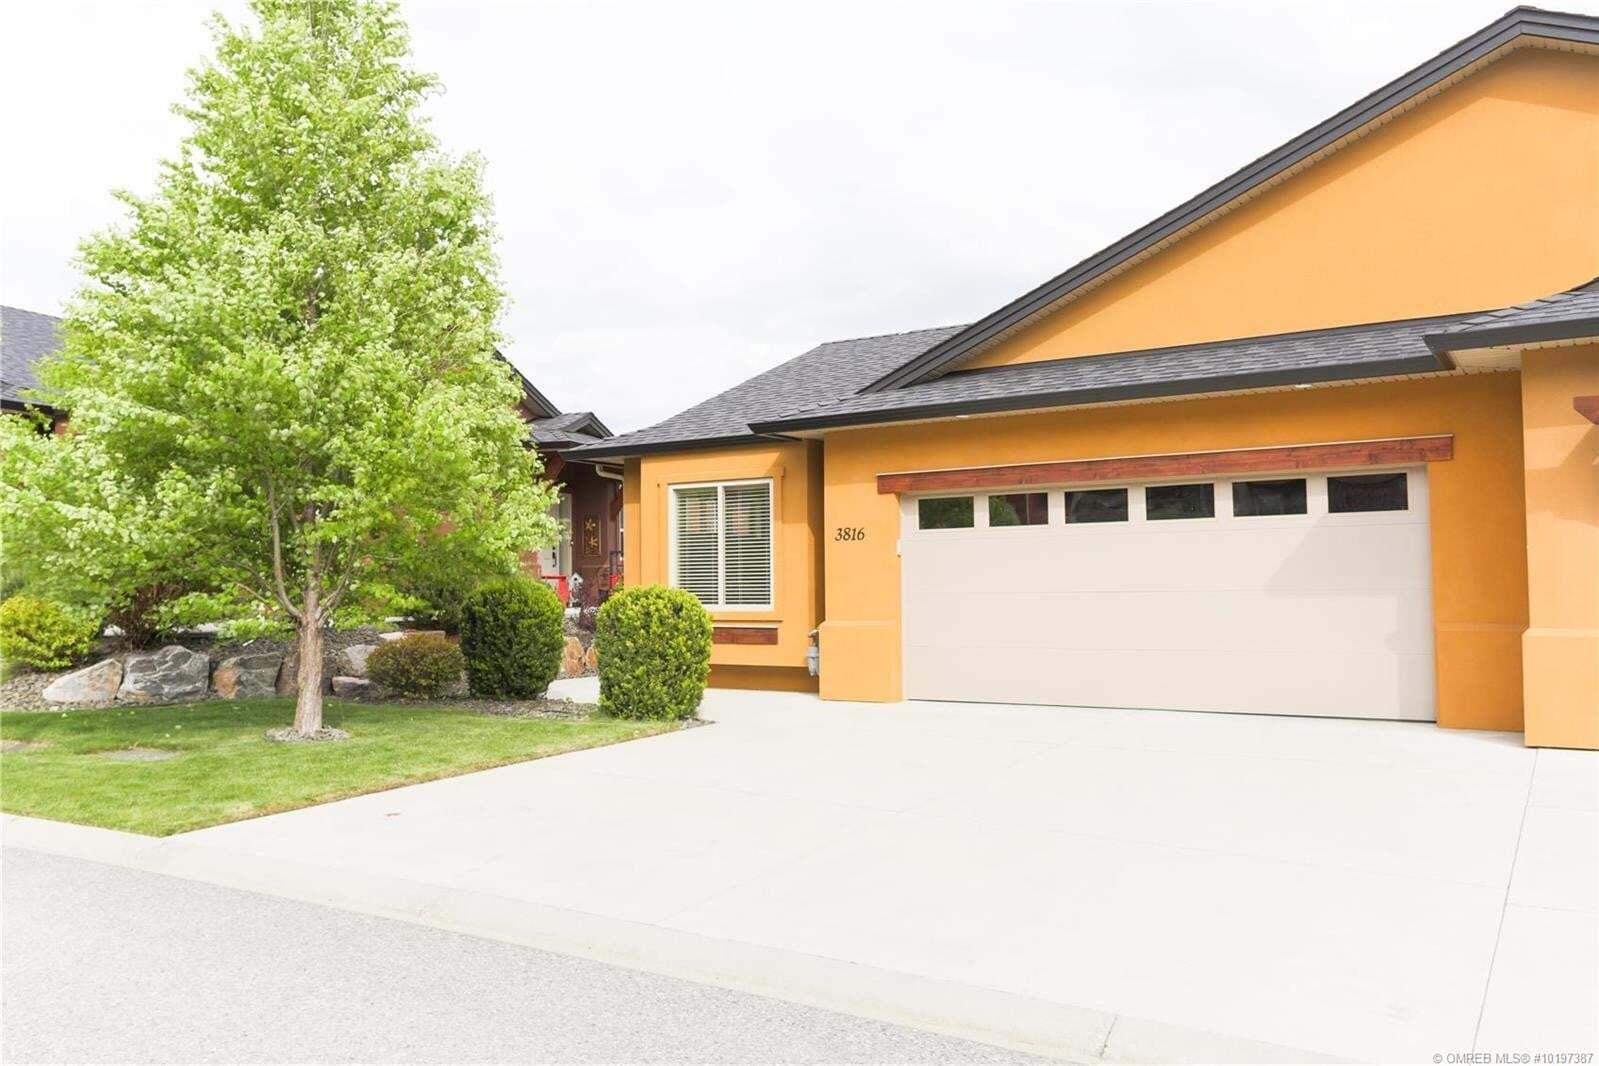 Townhouse for sale at 3816 Siringo Ln West Kelowna British Columbia - MLS: 10197387